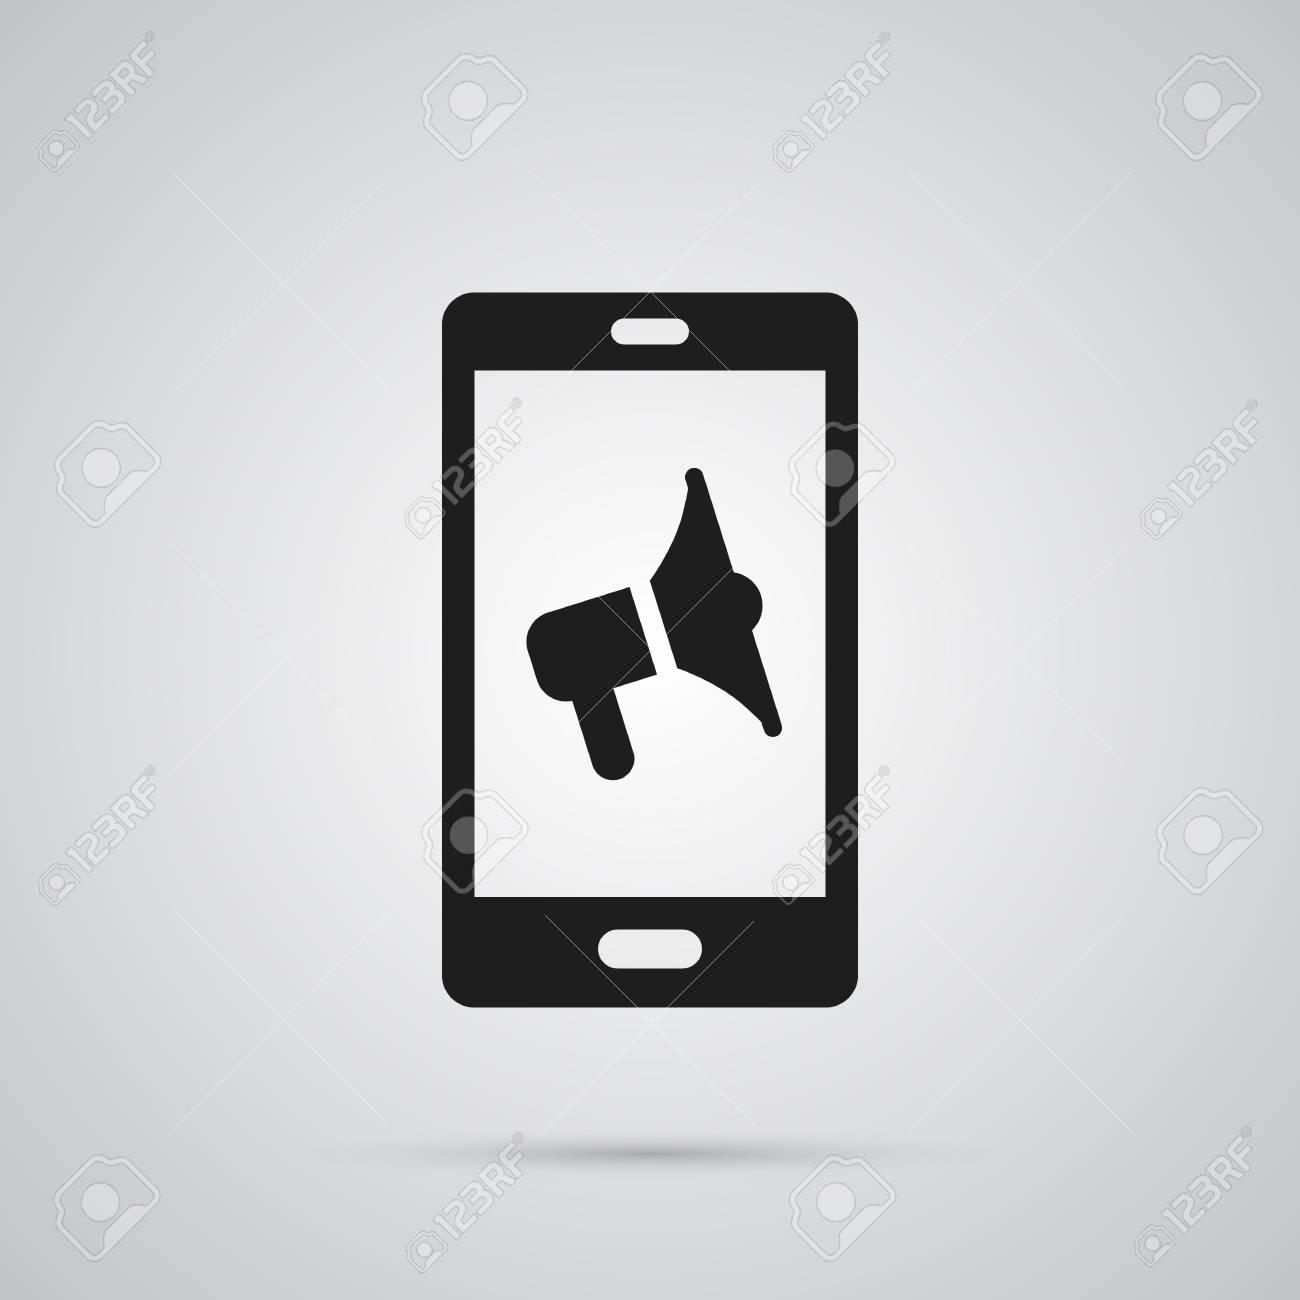 Smartphone brancher des applications